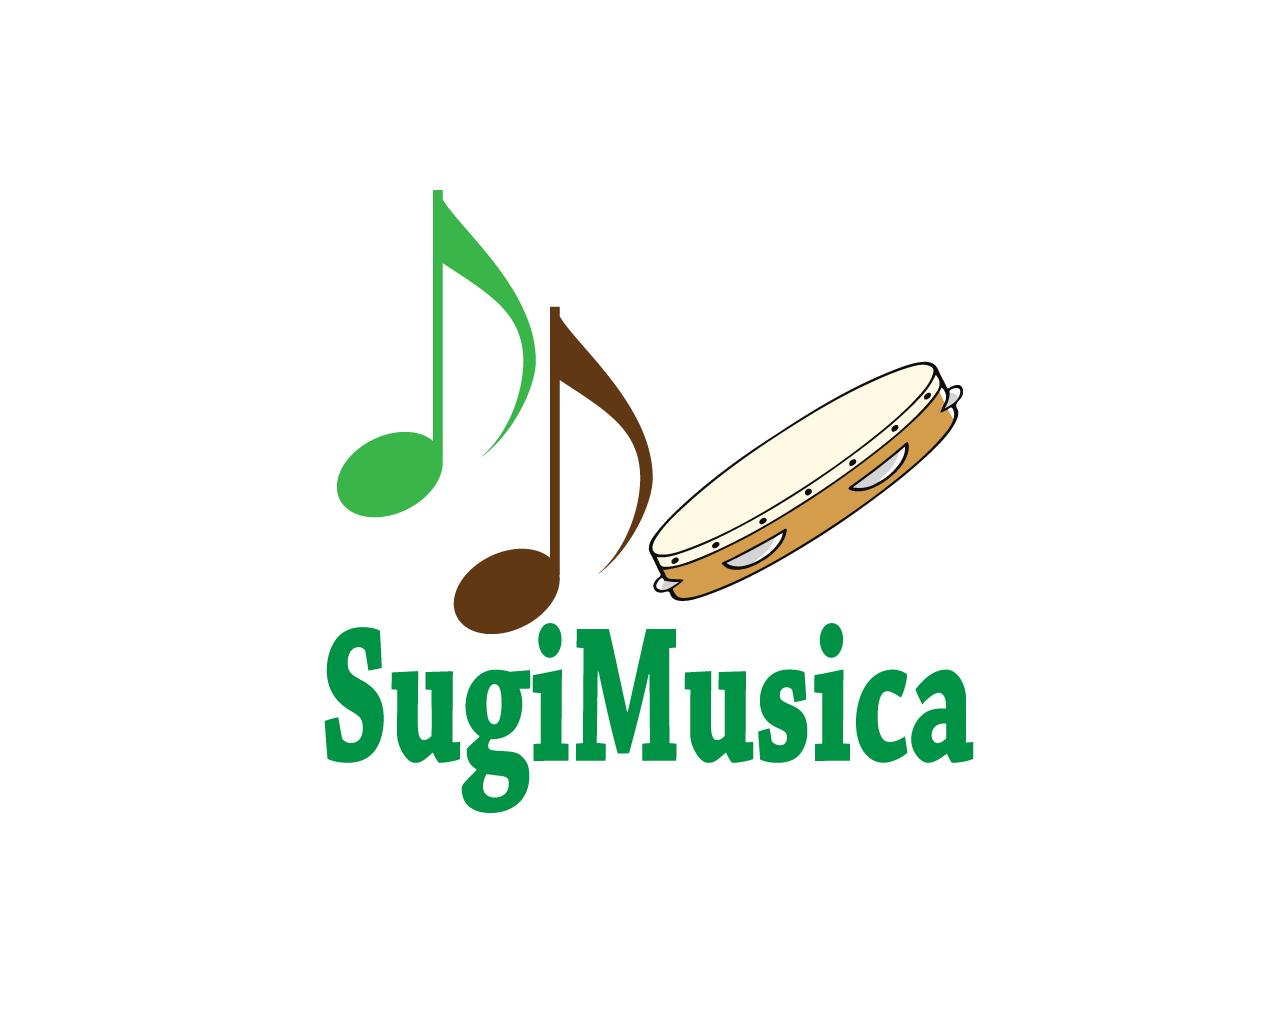 SugiMusica(スギムジカ)